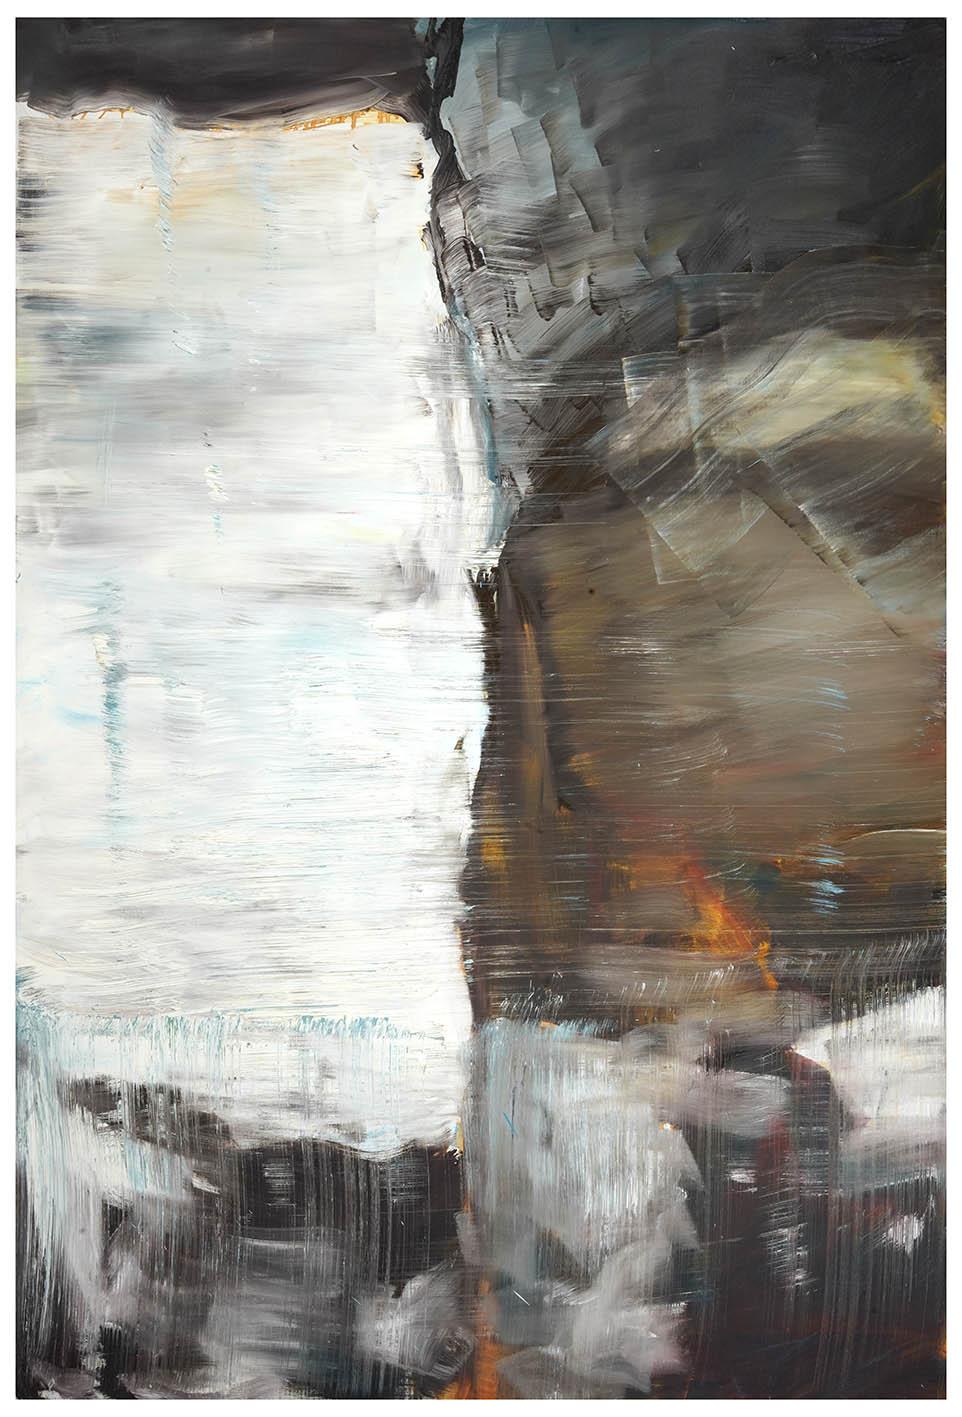 Herbert Brandl o.T., 2001, Öl auf Leinwand 180 x 120 cm Provenienz: Sammlung Ploner